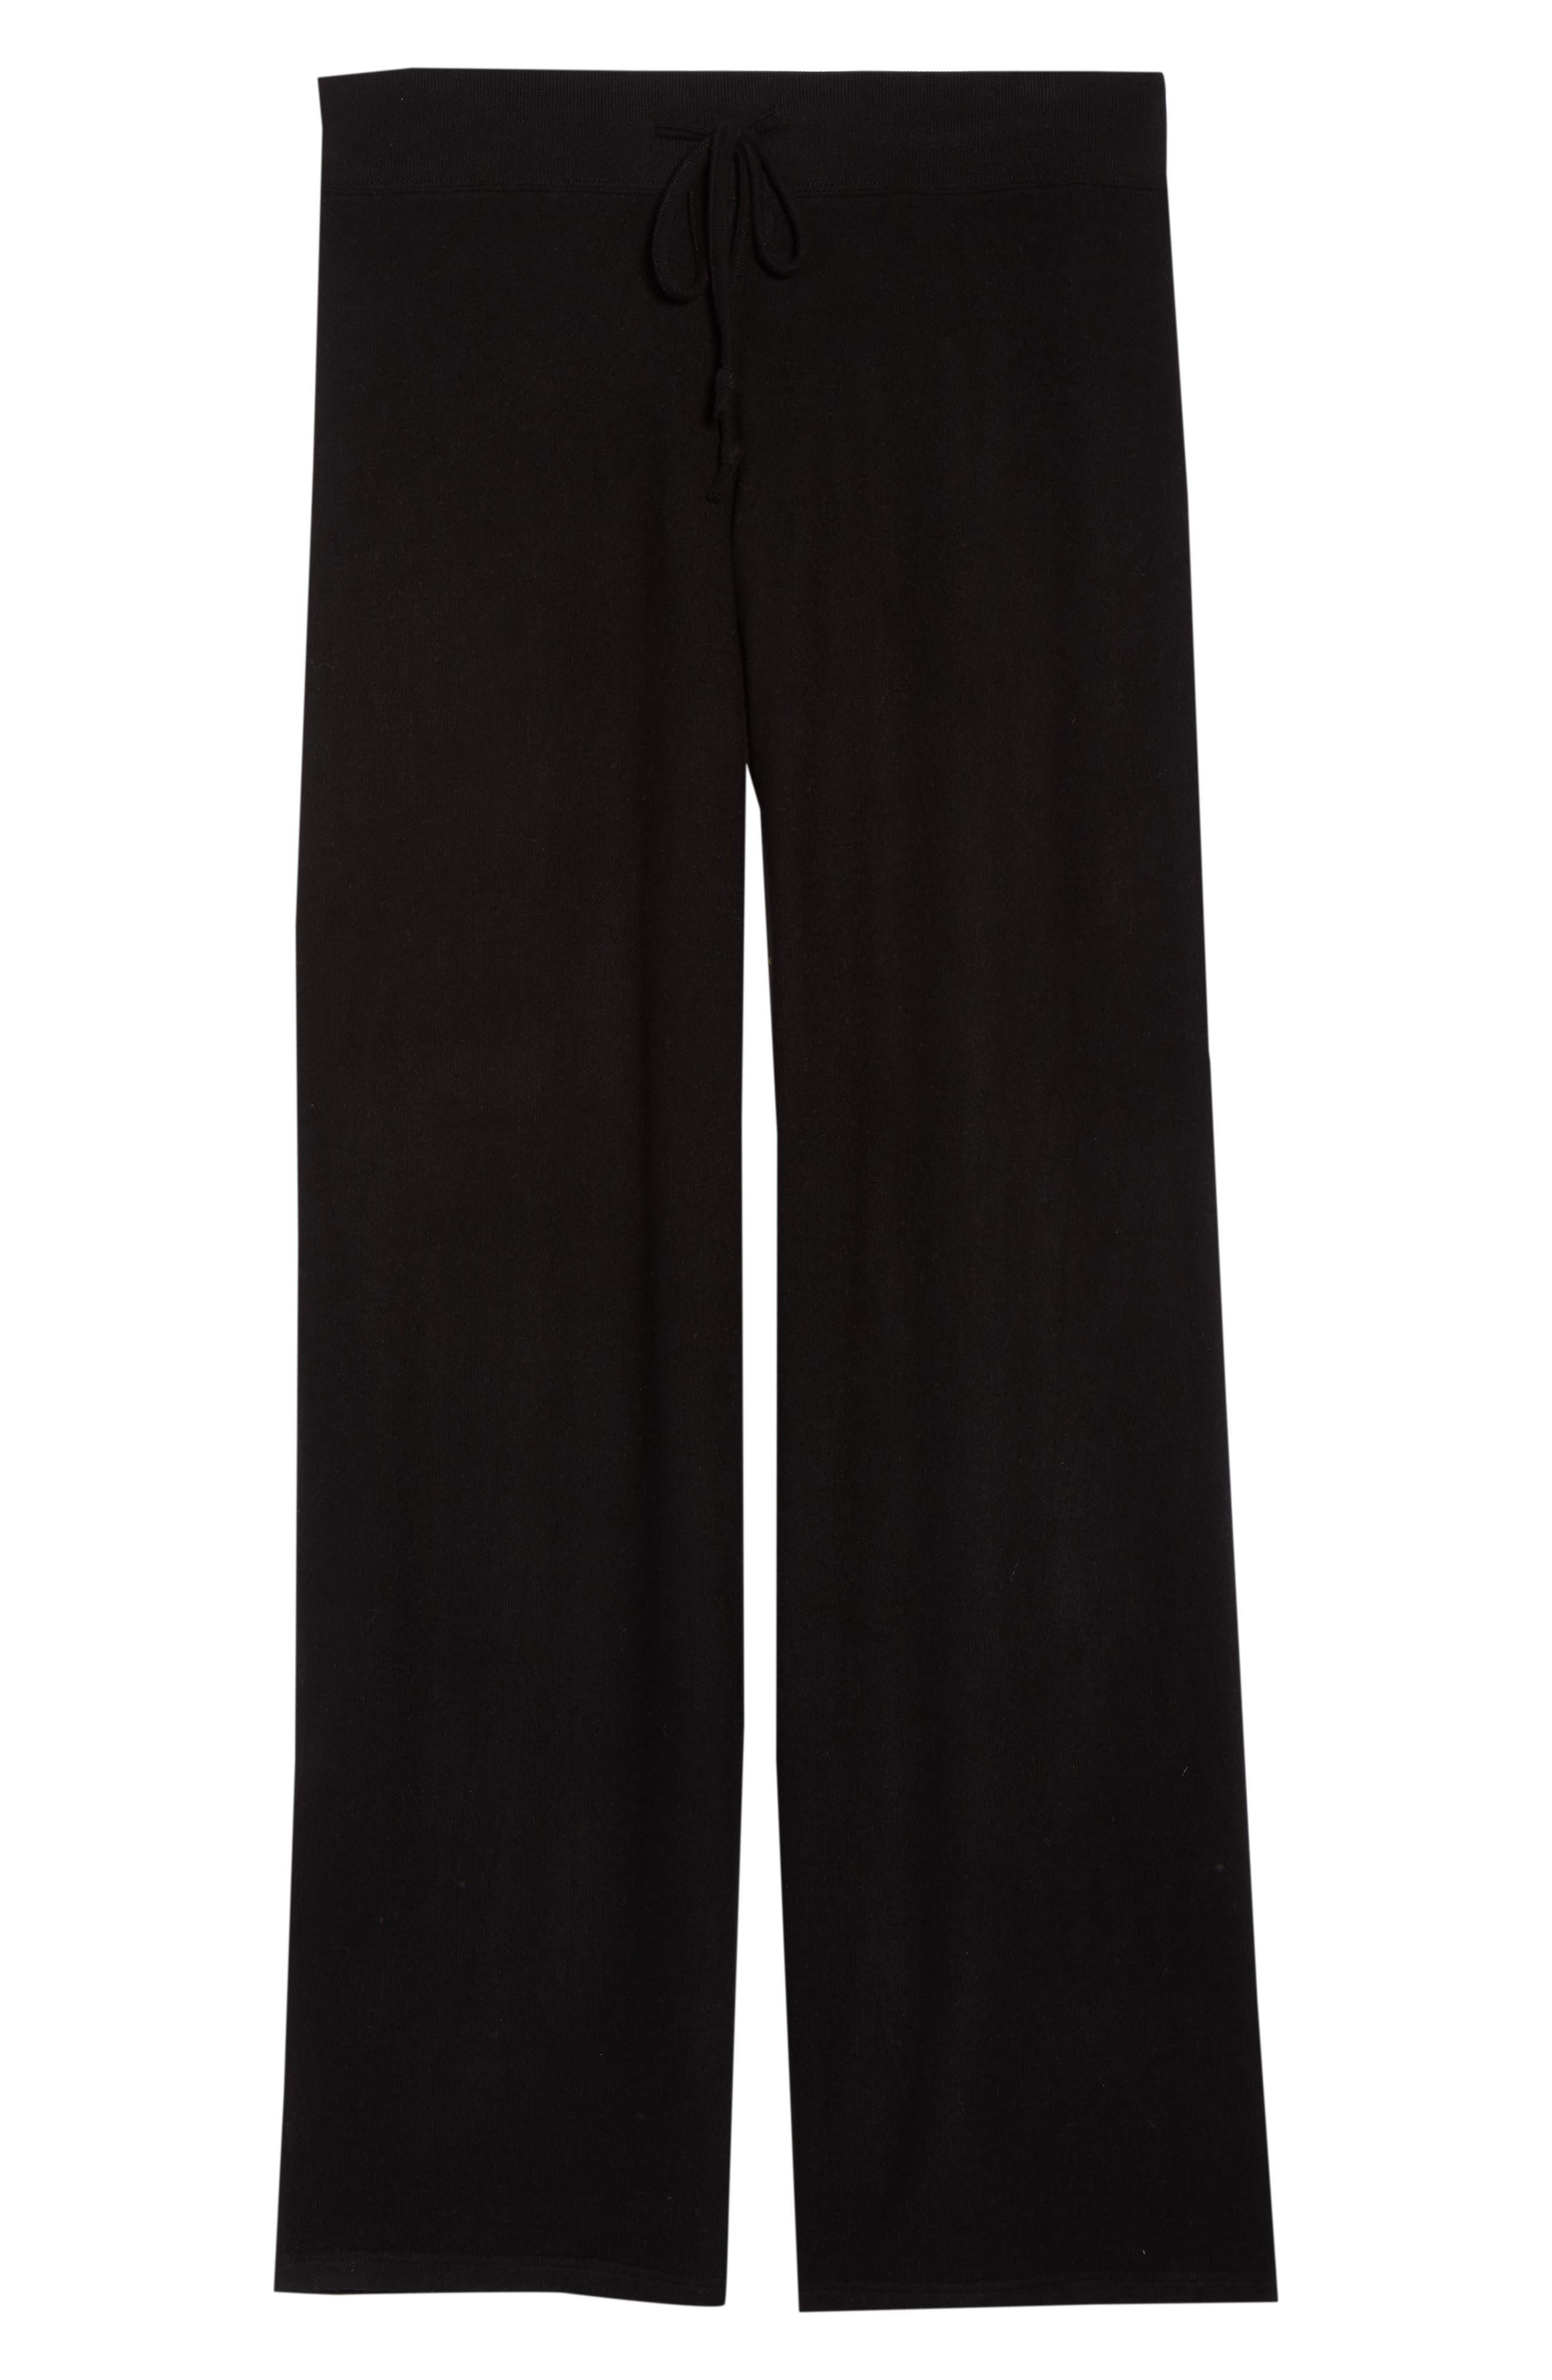 Alternate Image 1 Selected - Make + Model 'Best Boyfriend' Brushed Hacci Lounge Pants (Plus Size)